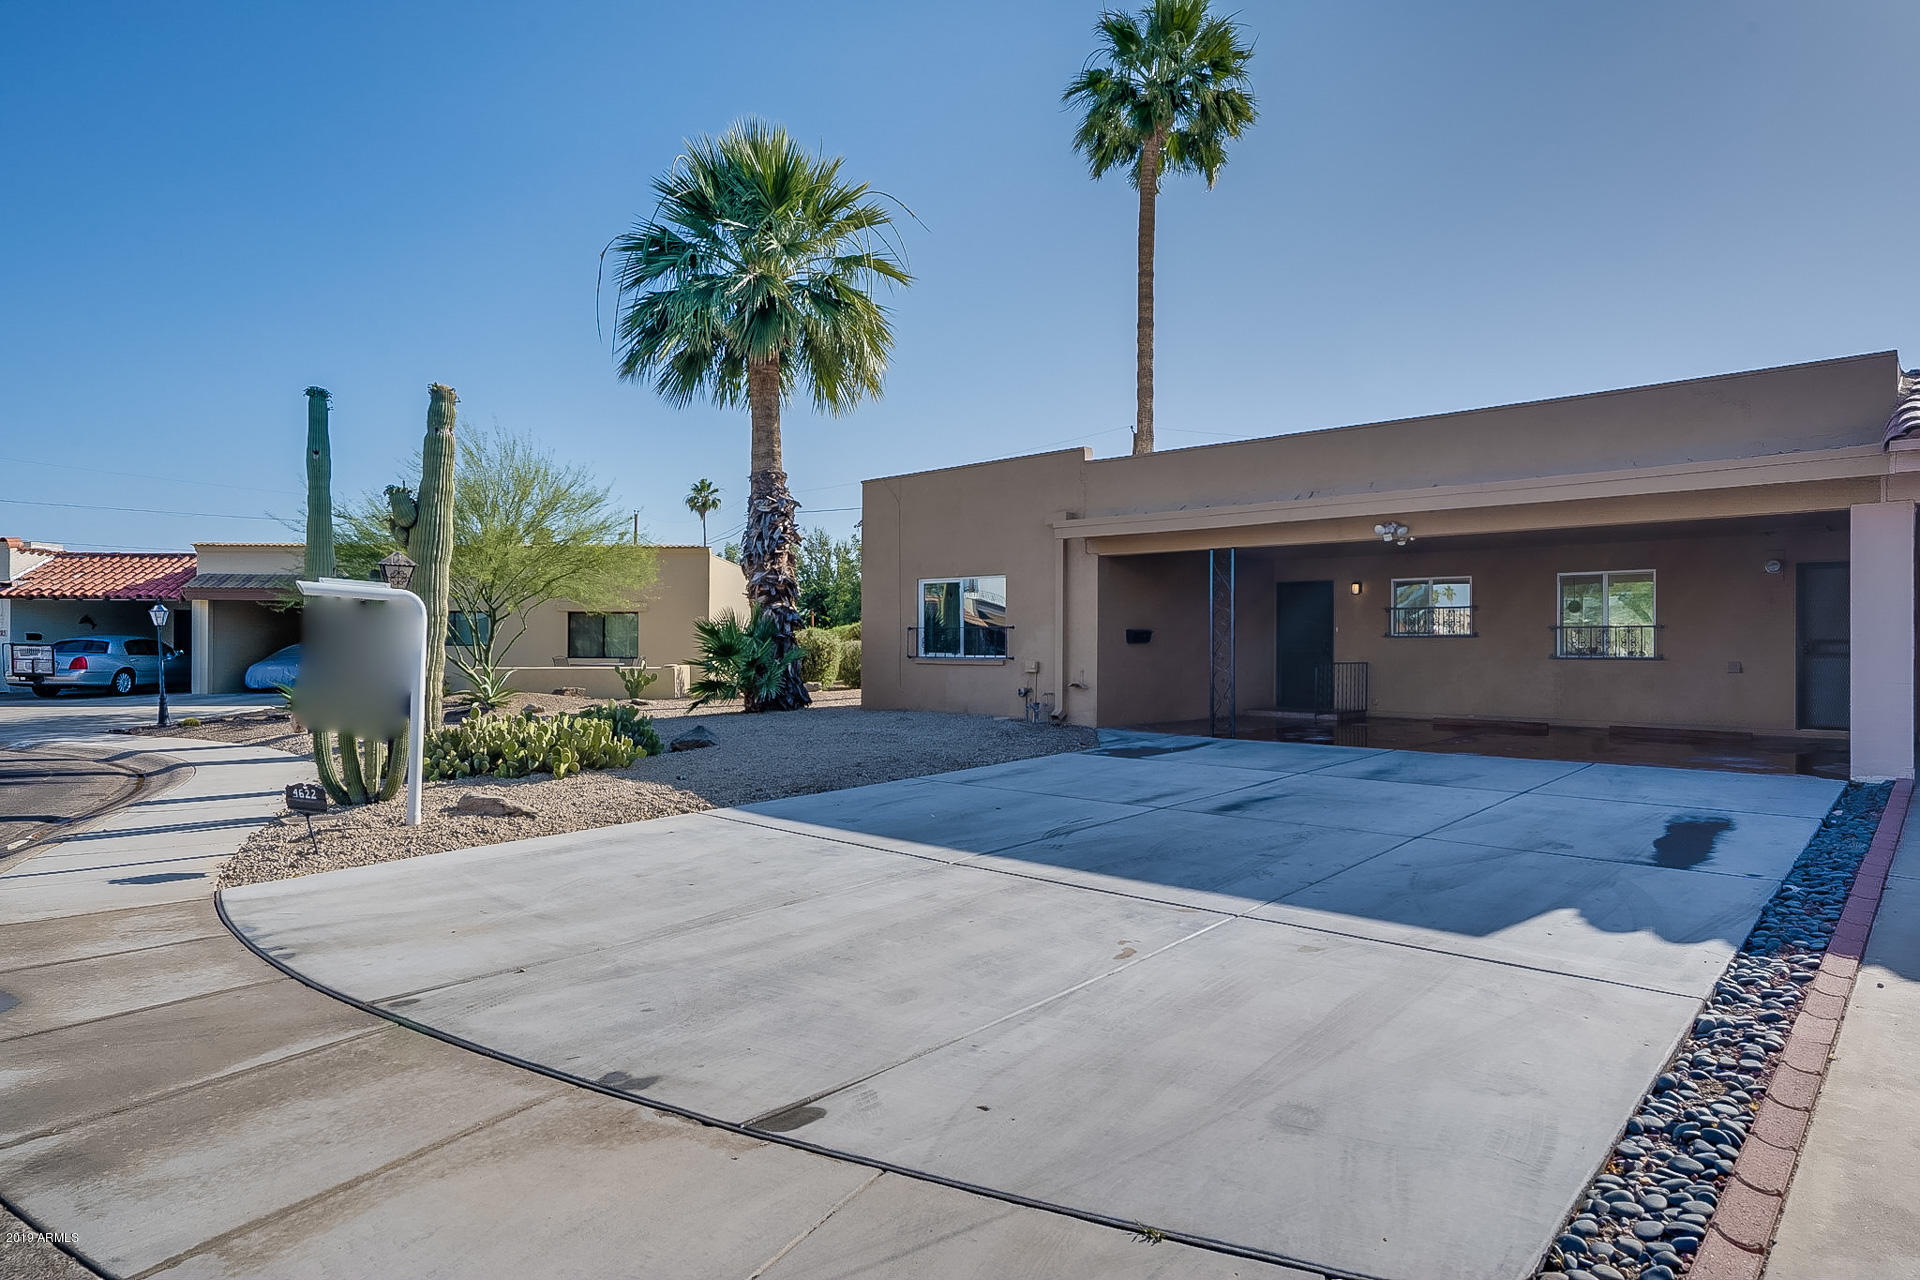 Photo of 4622 N 76TH Place, Scottsdale, AZ 85251